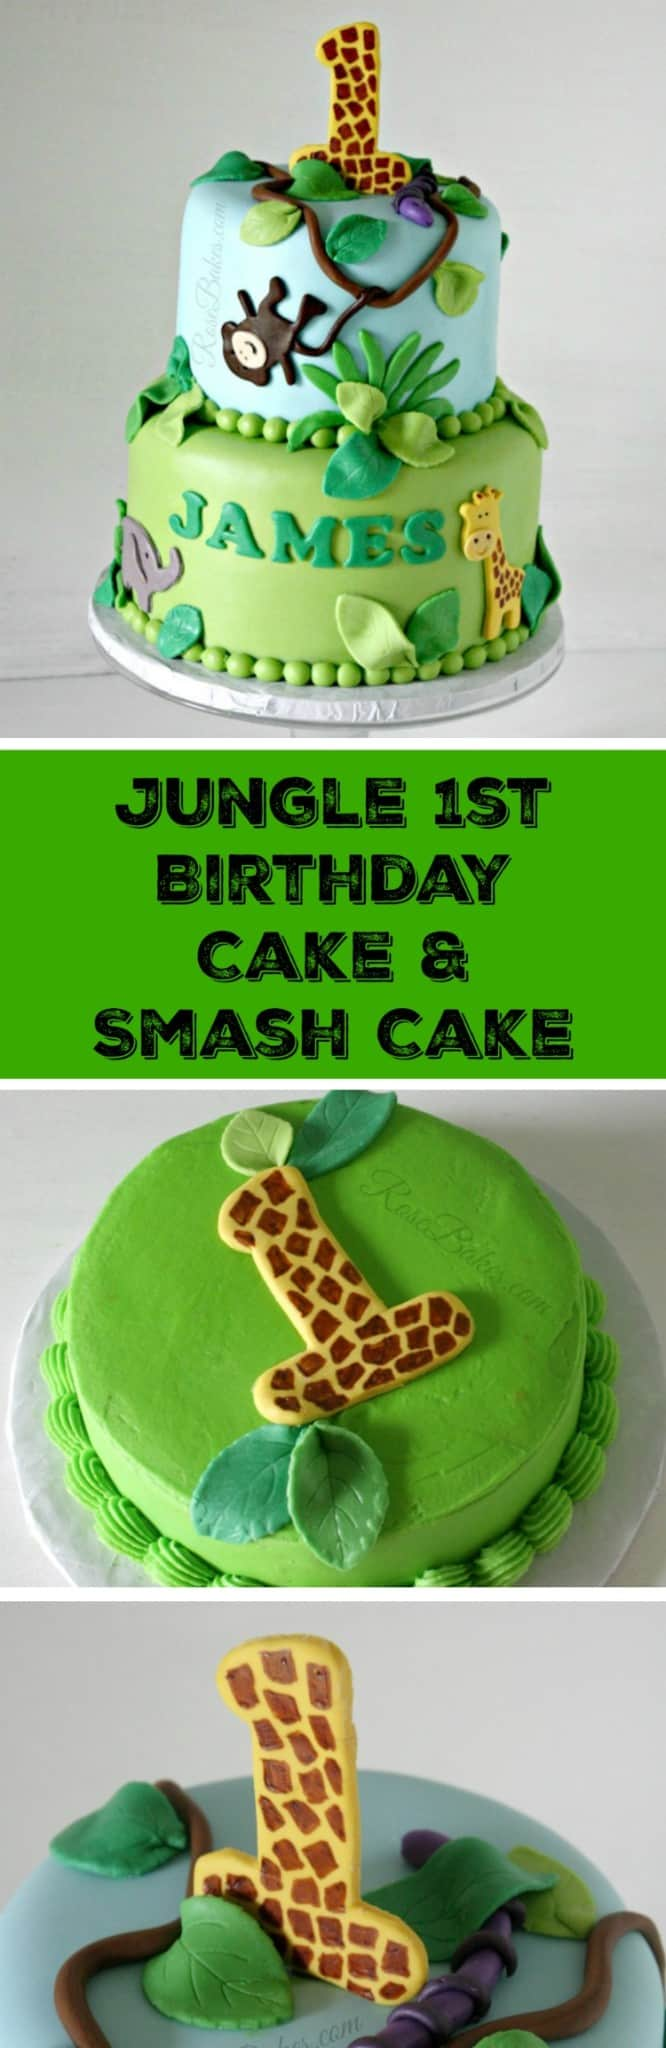 Wondrous Jungle 1St Birthday Cake Smash Cake Rose Bakes Funny Birthday Cards Online Inifodamsfinfo